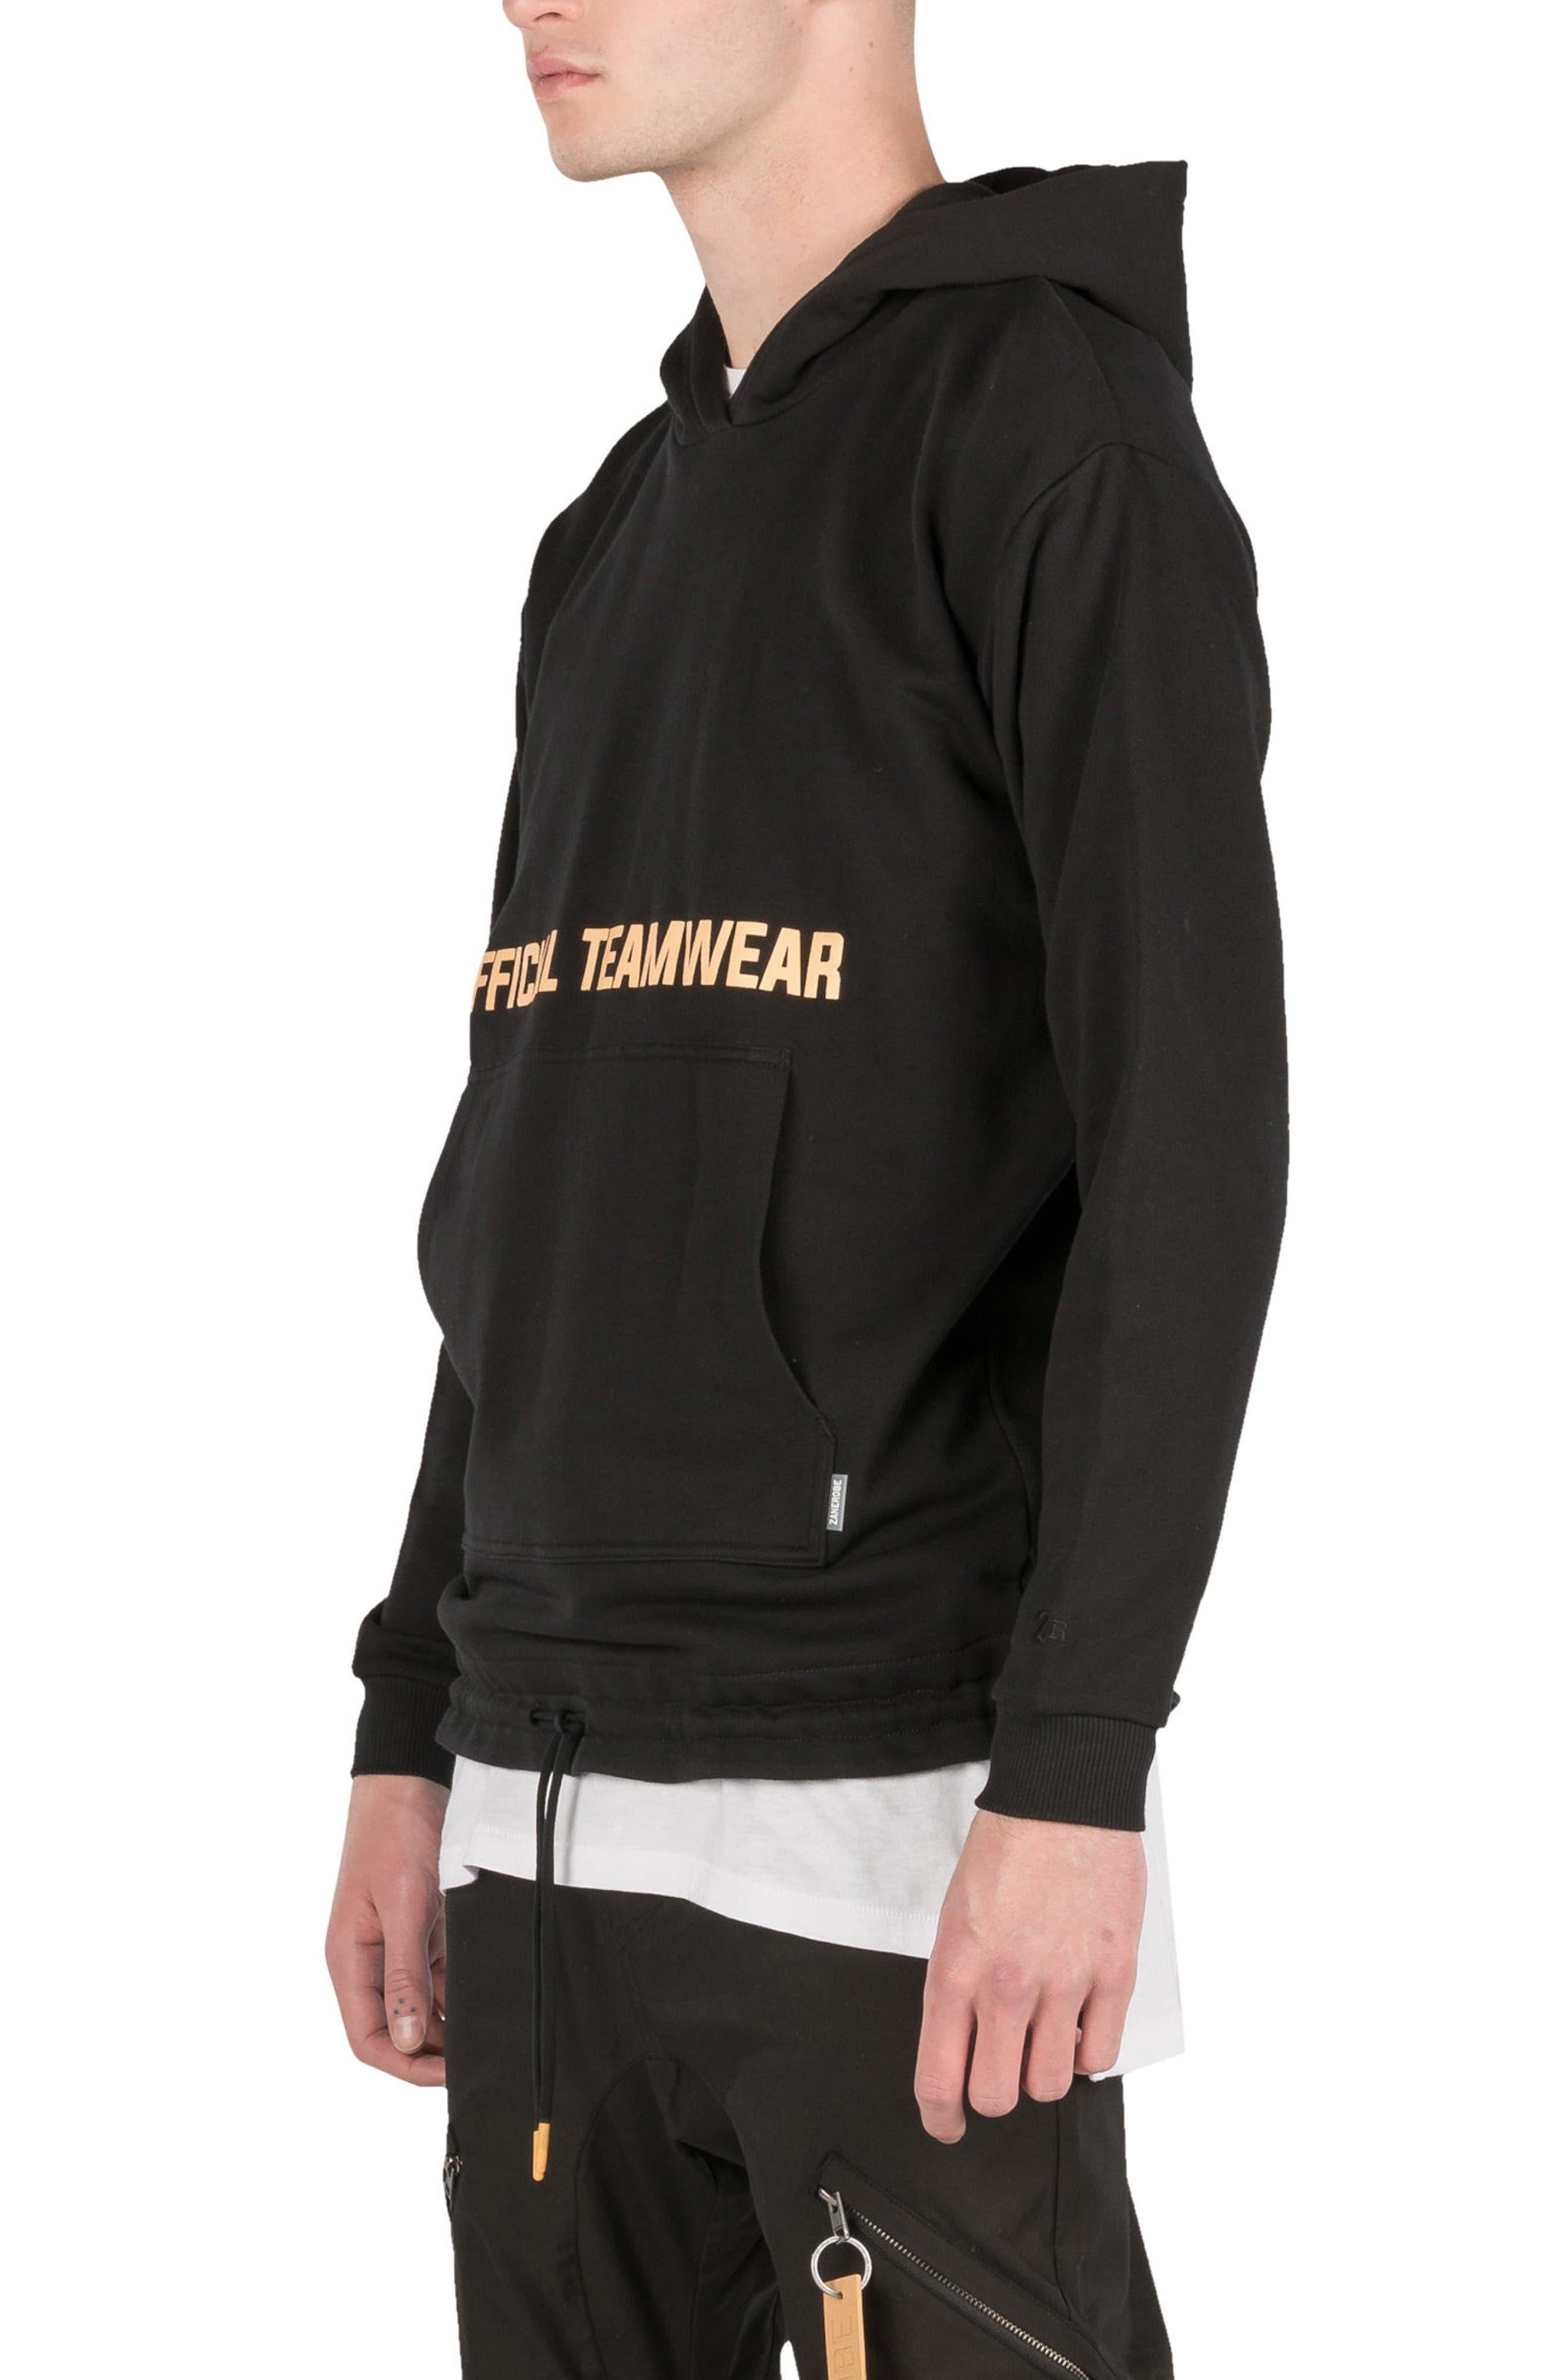 Teamwear Box Hoodie Sweatshirt,                             Alternate thumbnail 5, color,                             001